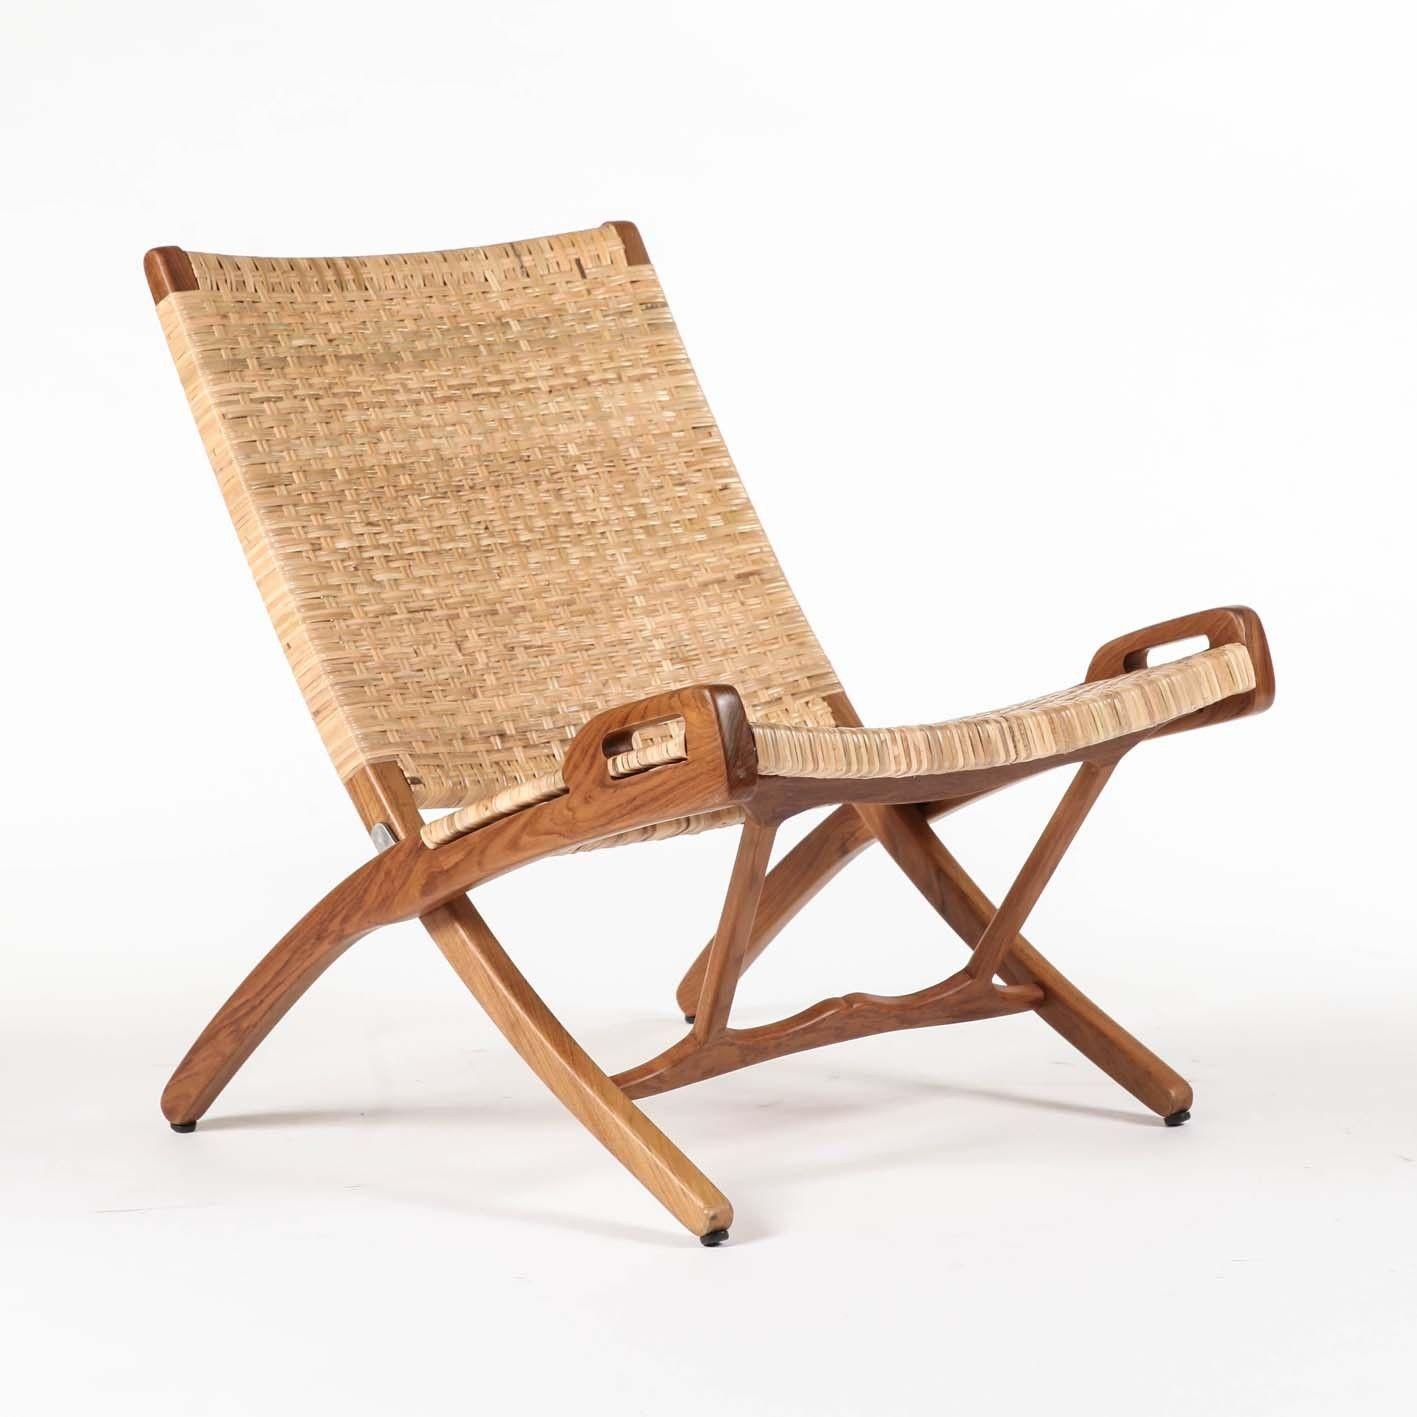 MatthewIzzo.com   Vilhelm Lounger Folding Chair Teak And Rattan #living  #garden Room #folding Lounge Chair